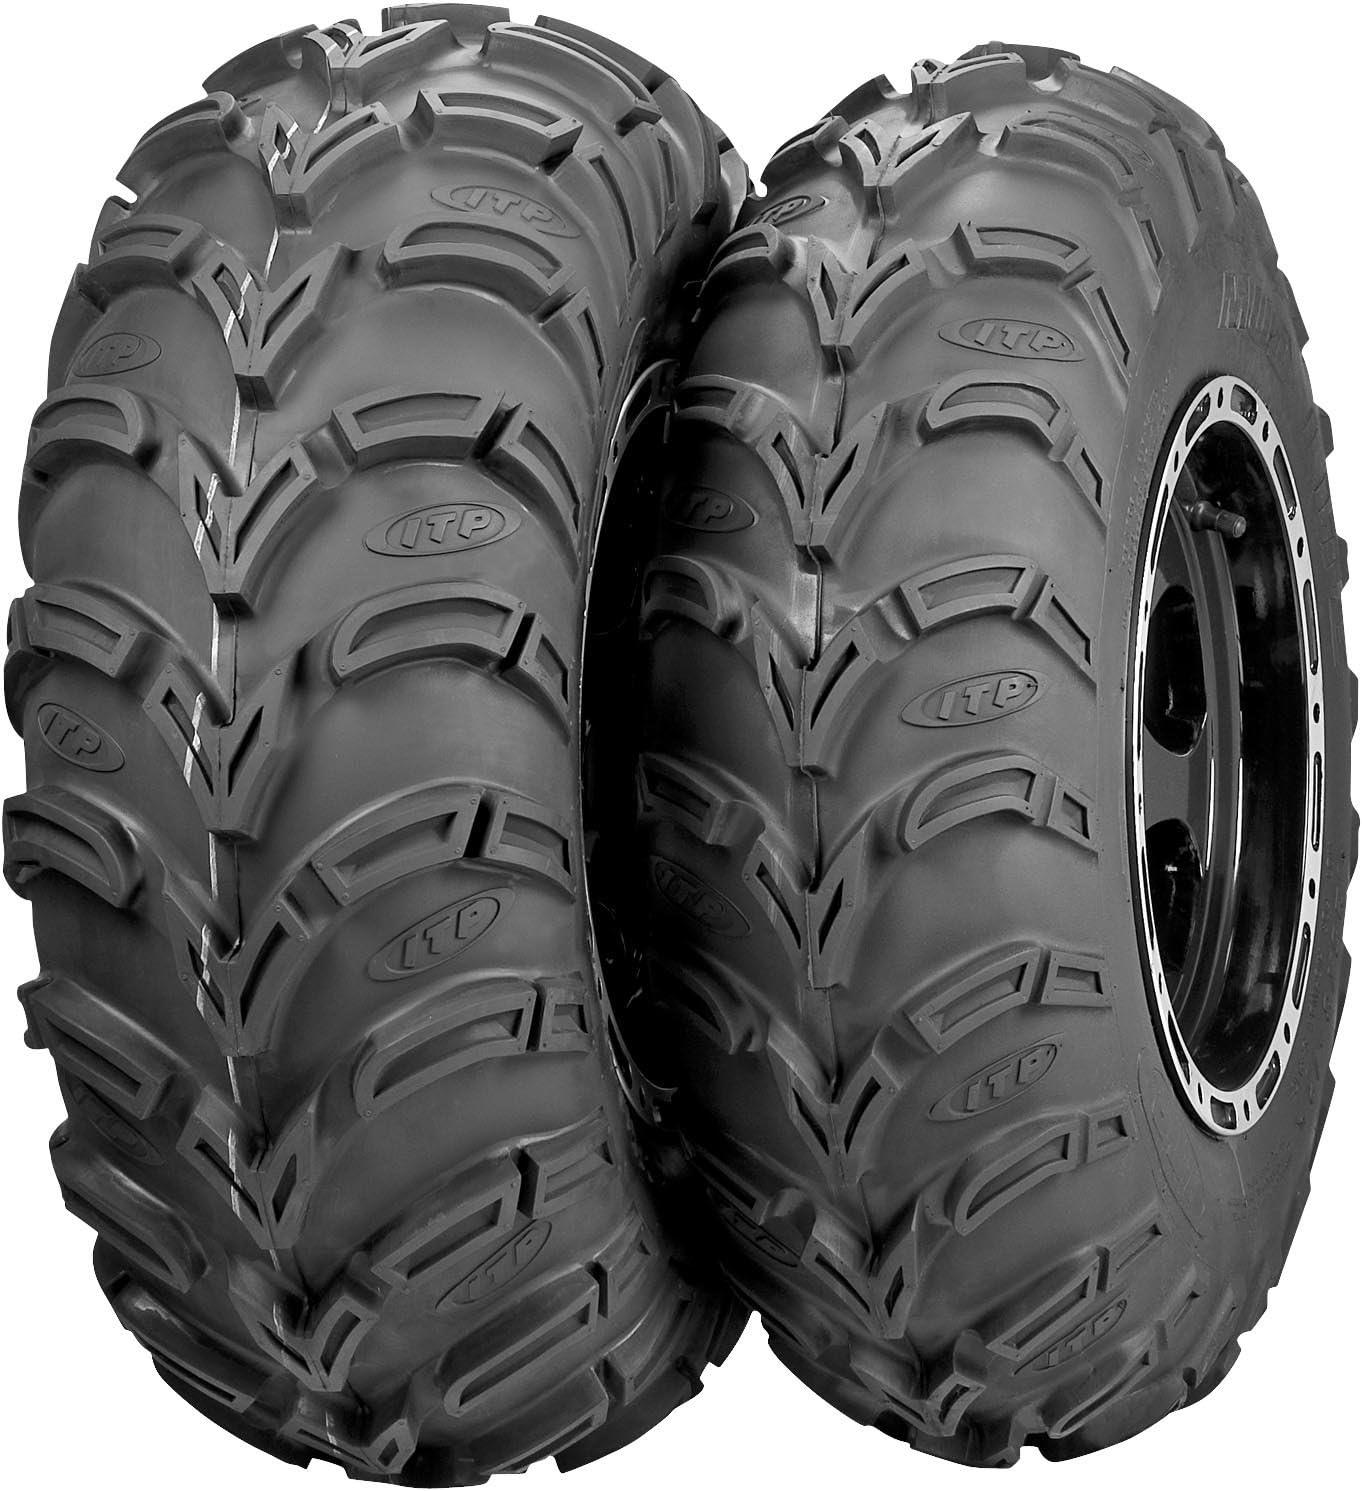 ITP Mud Lite AT 6 PLY ATV Tire size 25x10x12